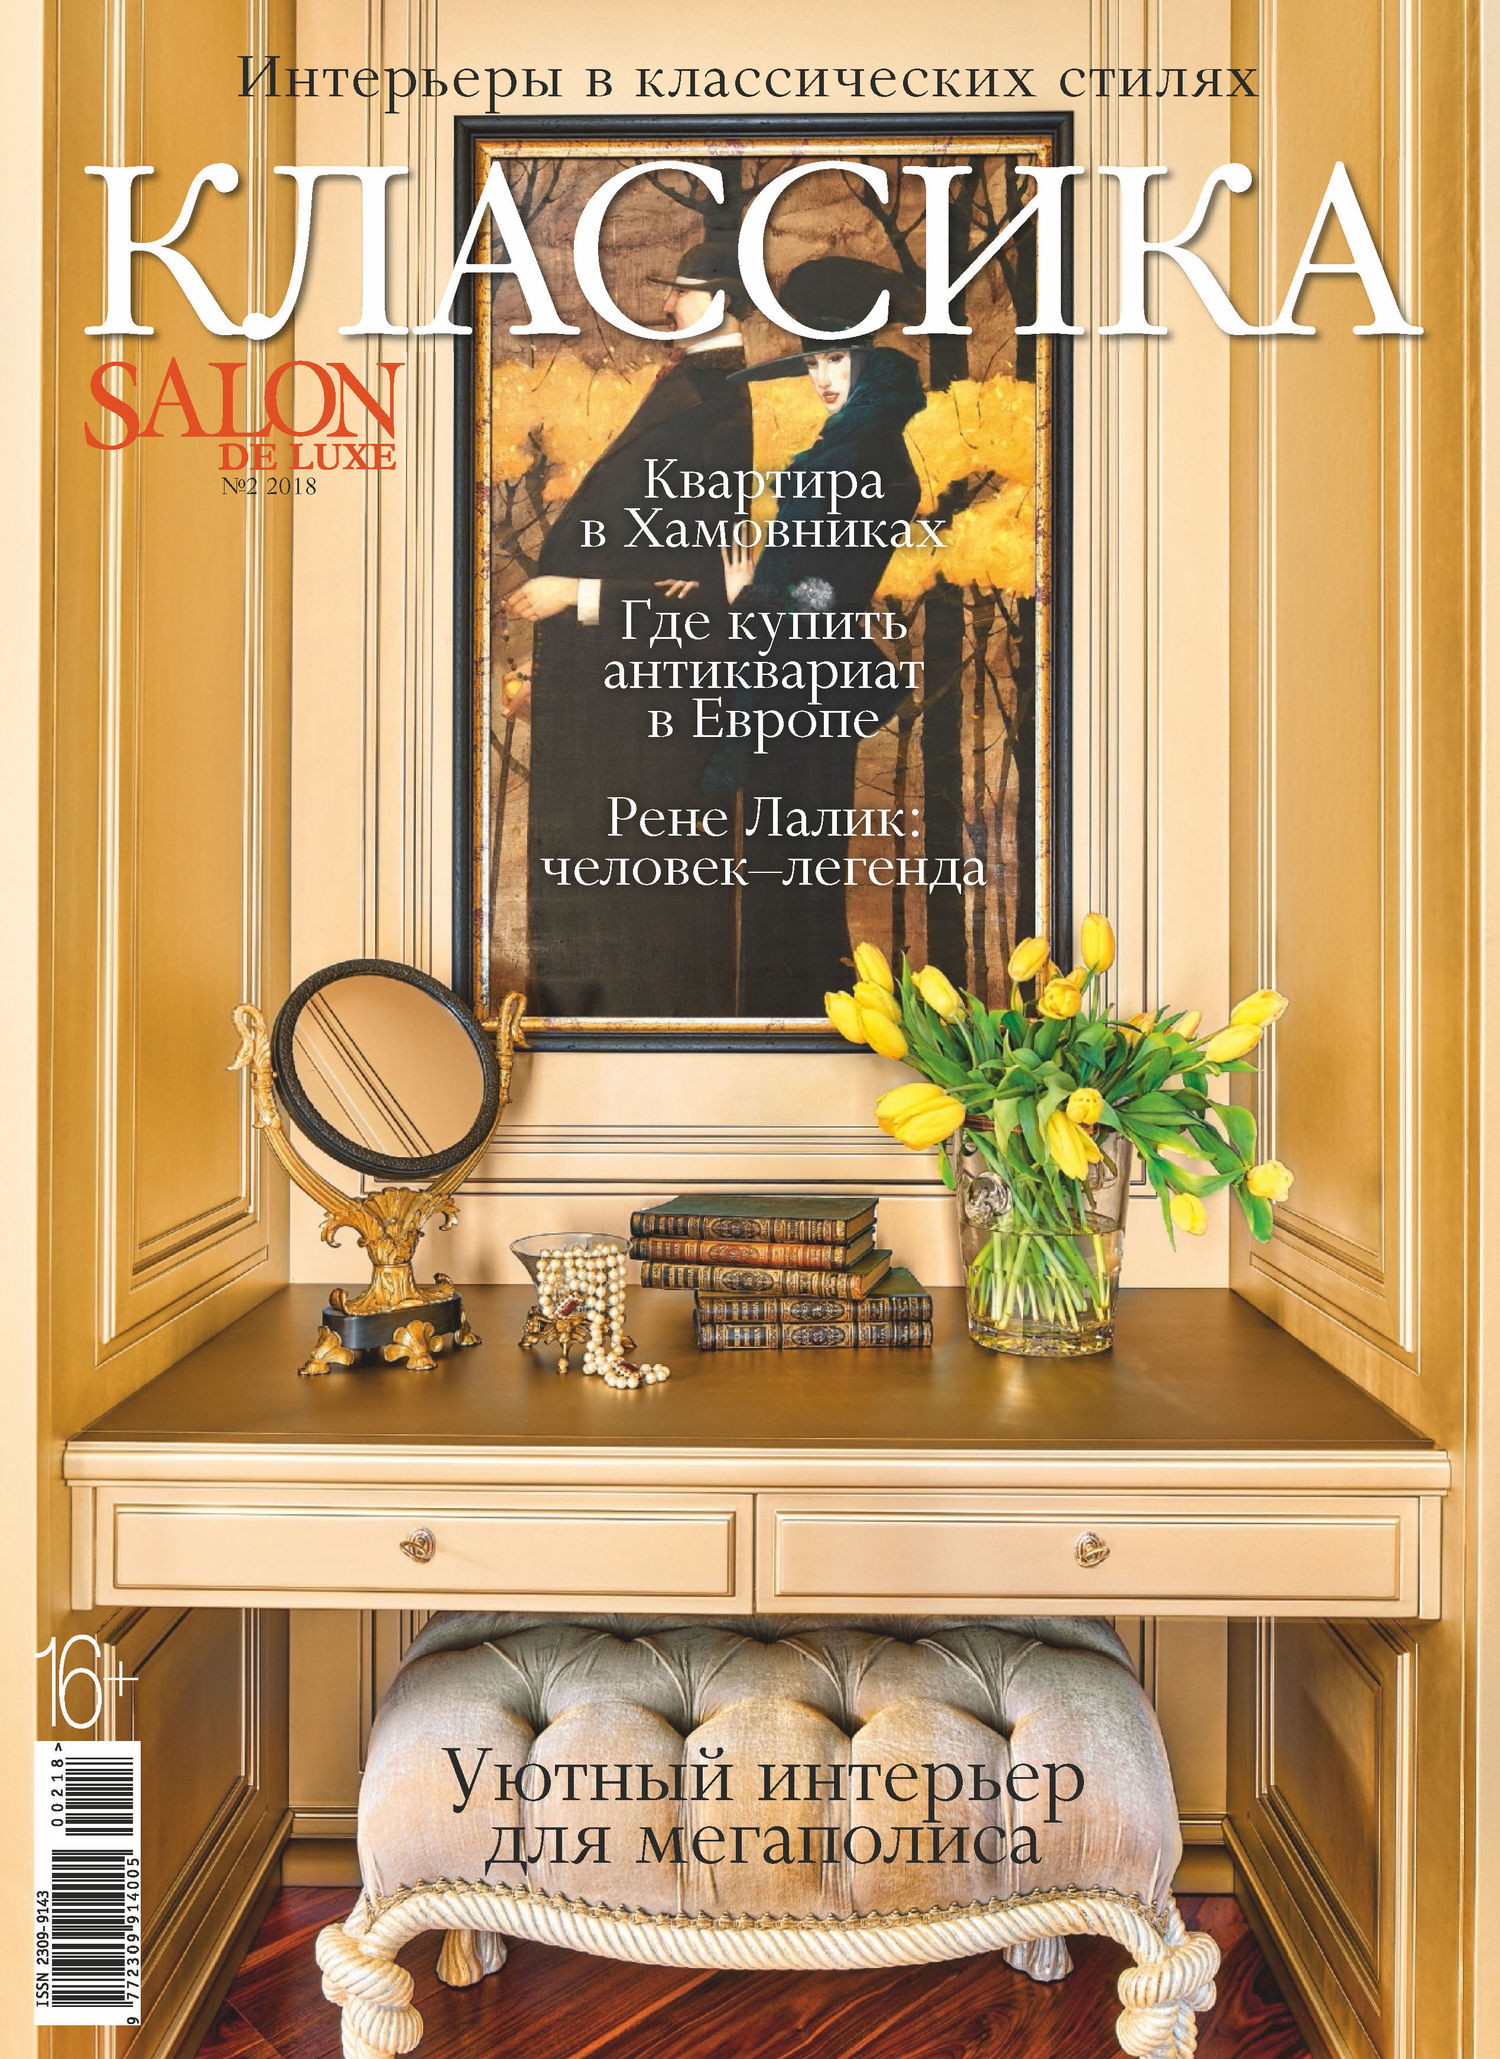 SALON de LUXE. Спецвыпуск журнала SALON-interior. №02/2018